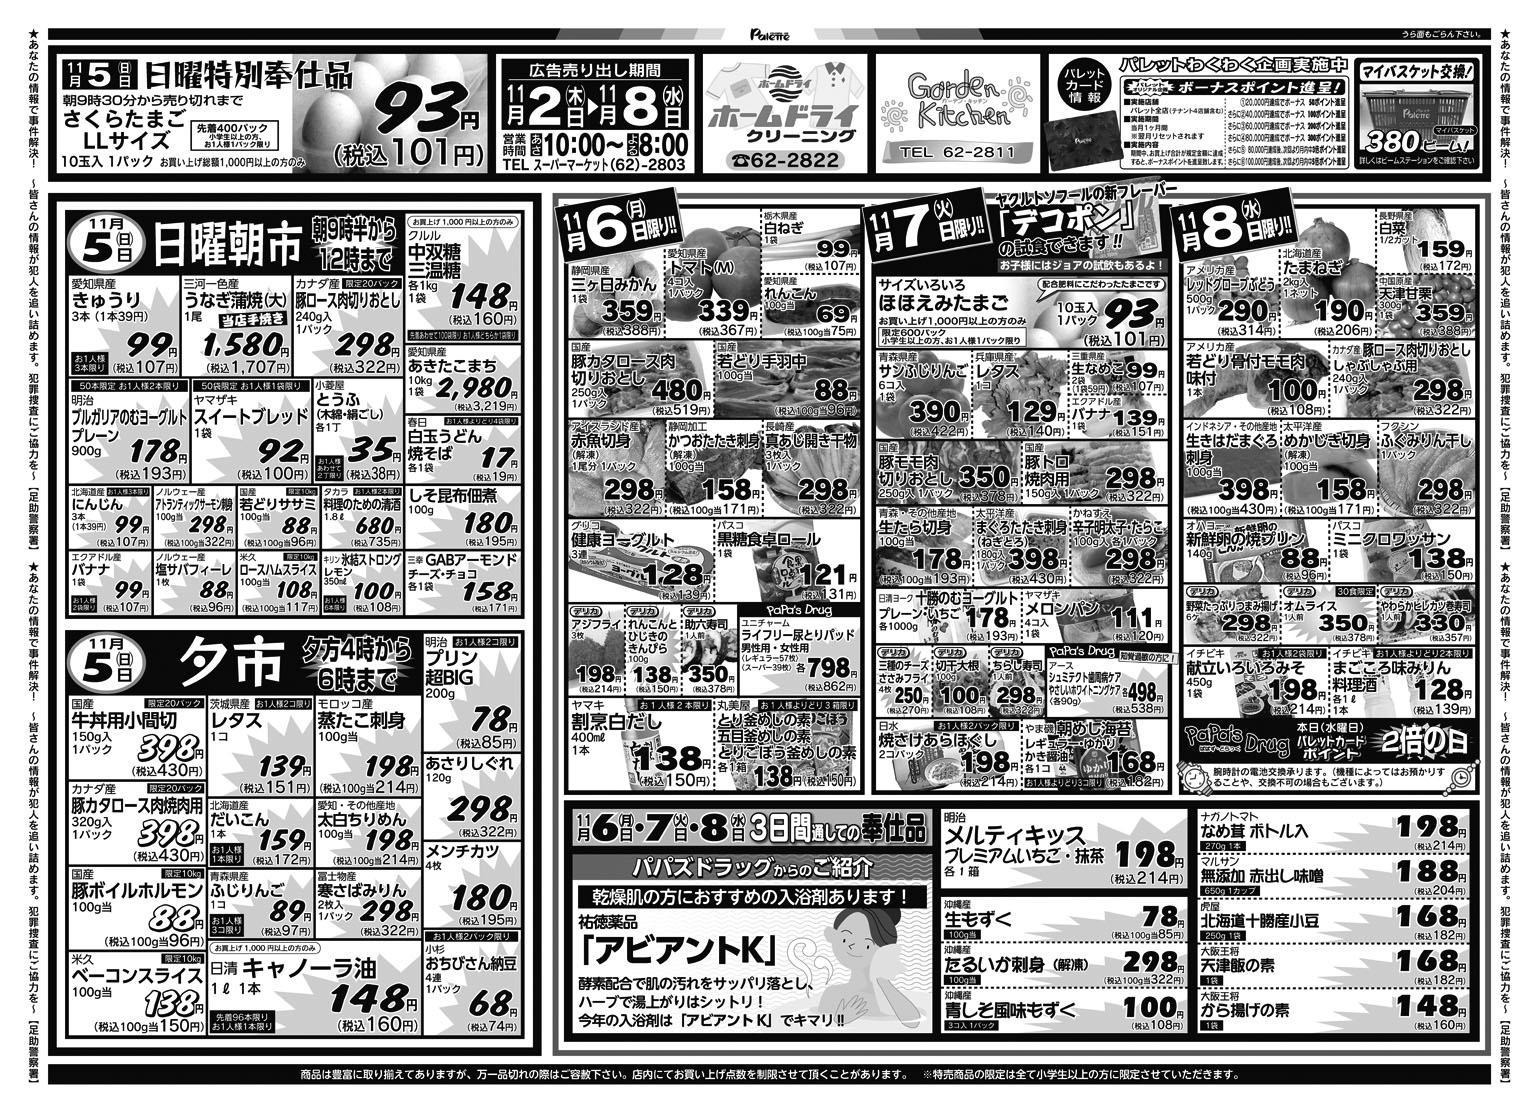 http://akibito.jp/palette/c84b6c47a2f3d08c86f592df37d7cf8e916522f8.jpg